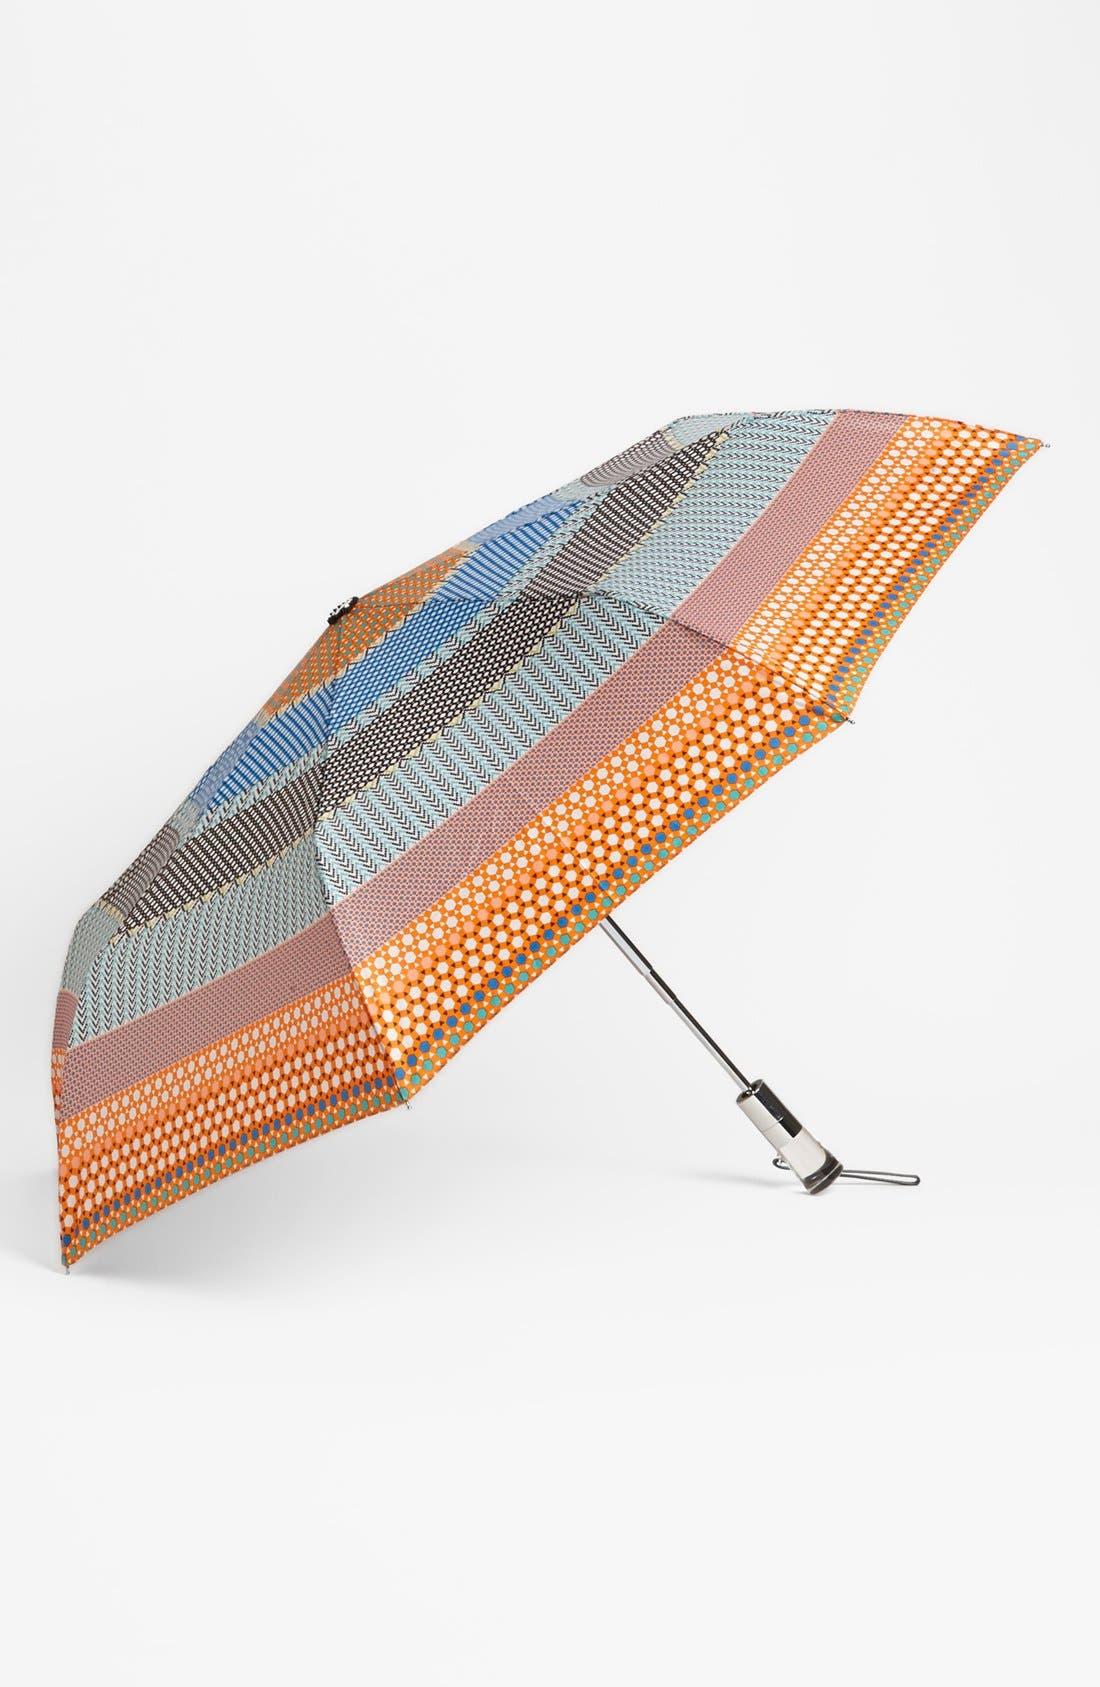 Alternate Image 1 Selected - ShedRain Auto Open & Close Umbrella